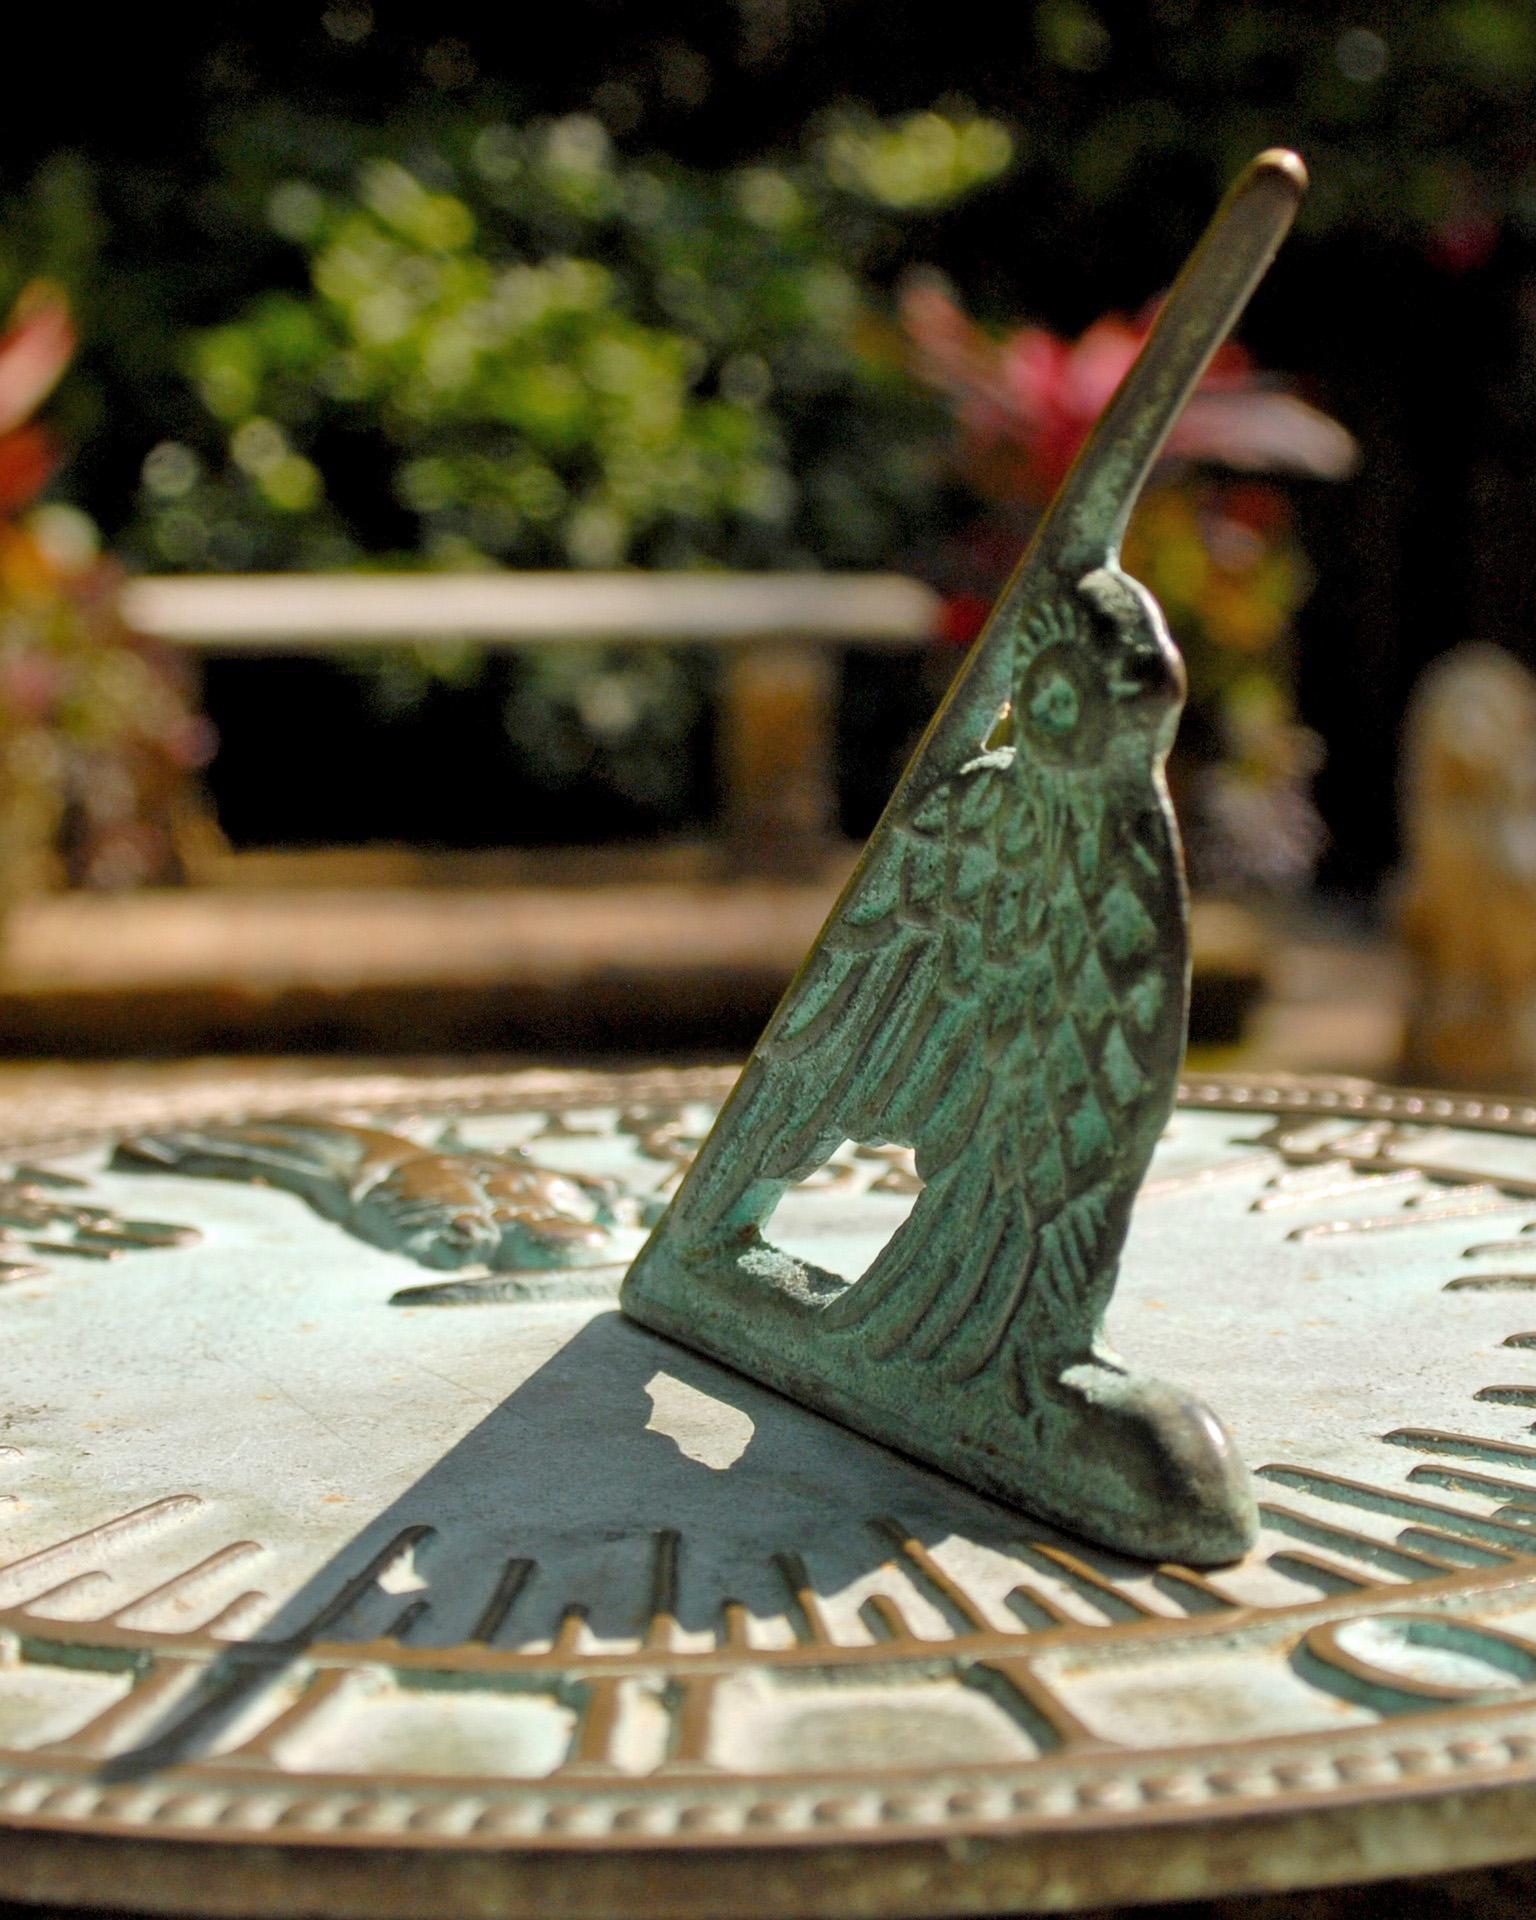 Tempus Fugit! Call in York Gardening!